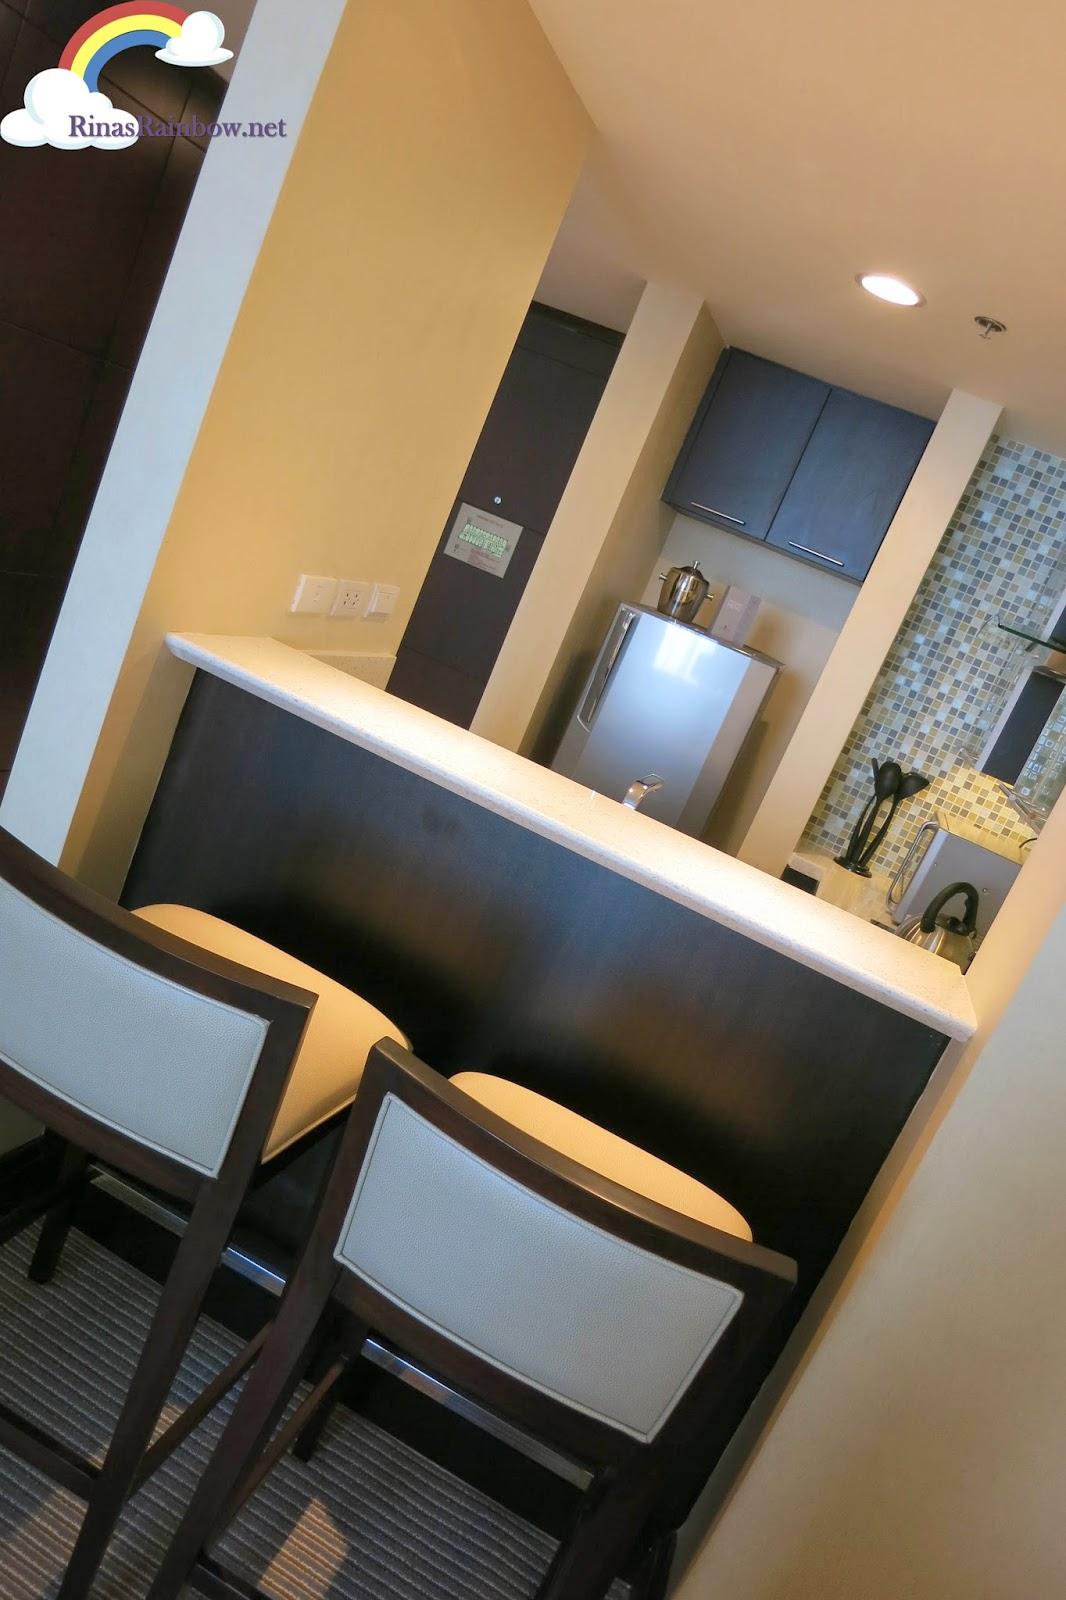 bar stools in hotel room